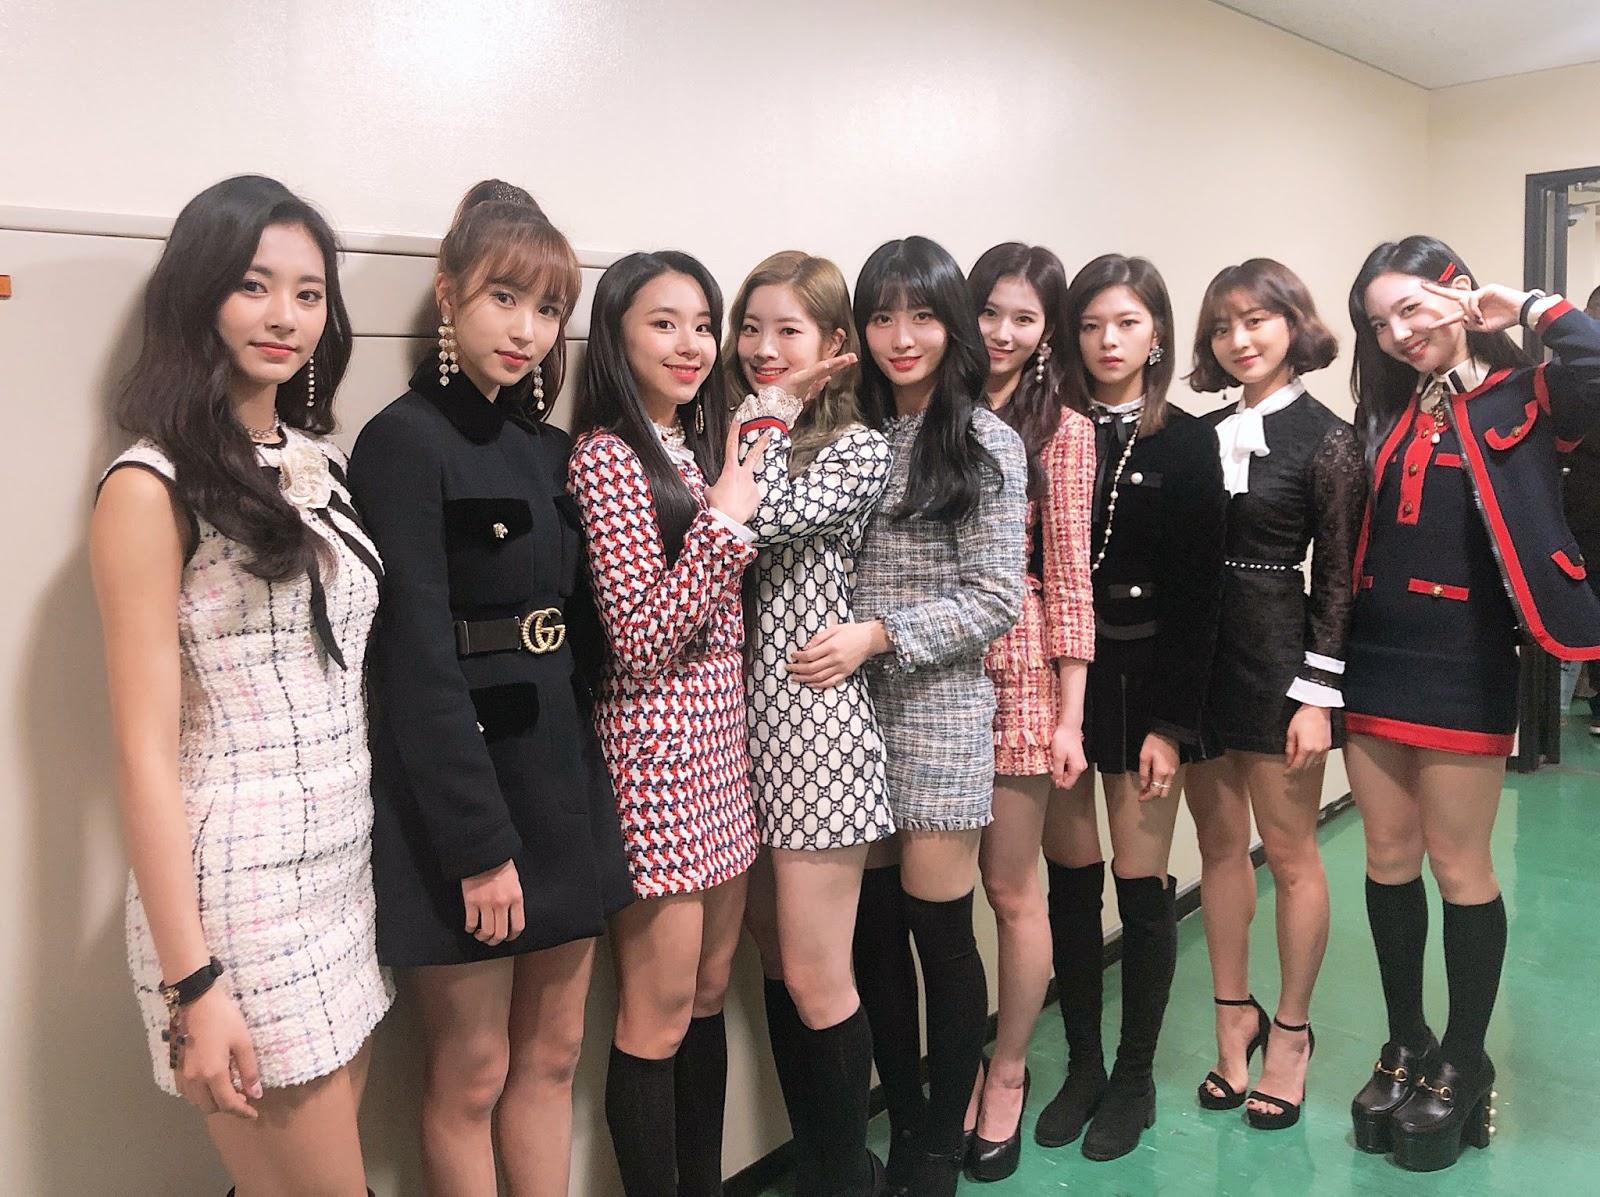 twice jeongyeon dorm 3